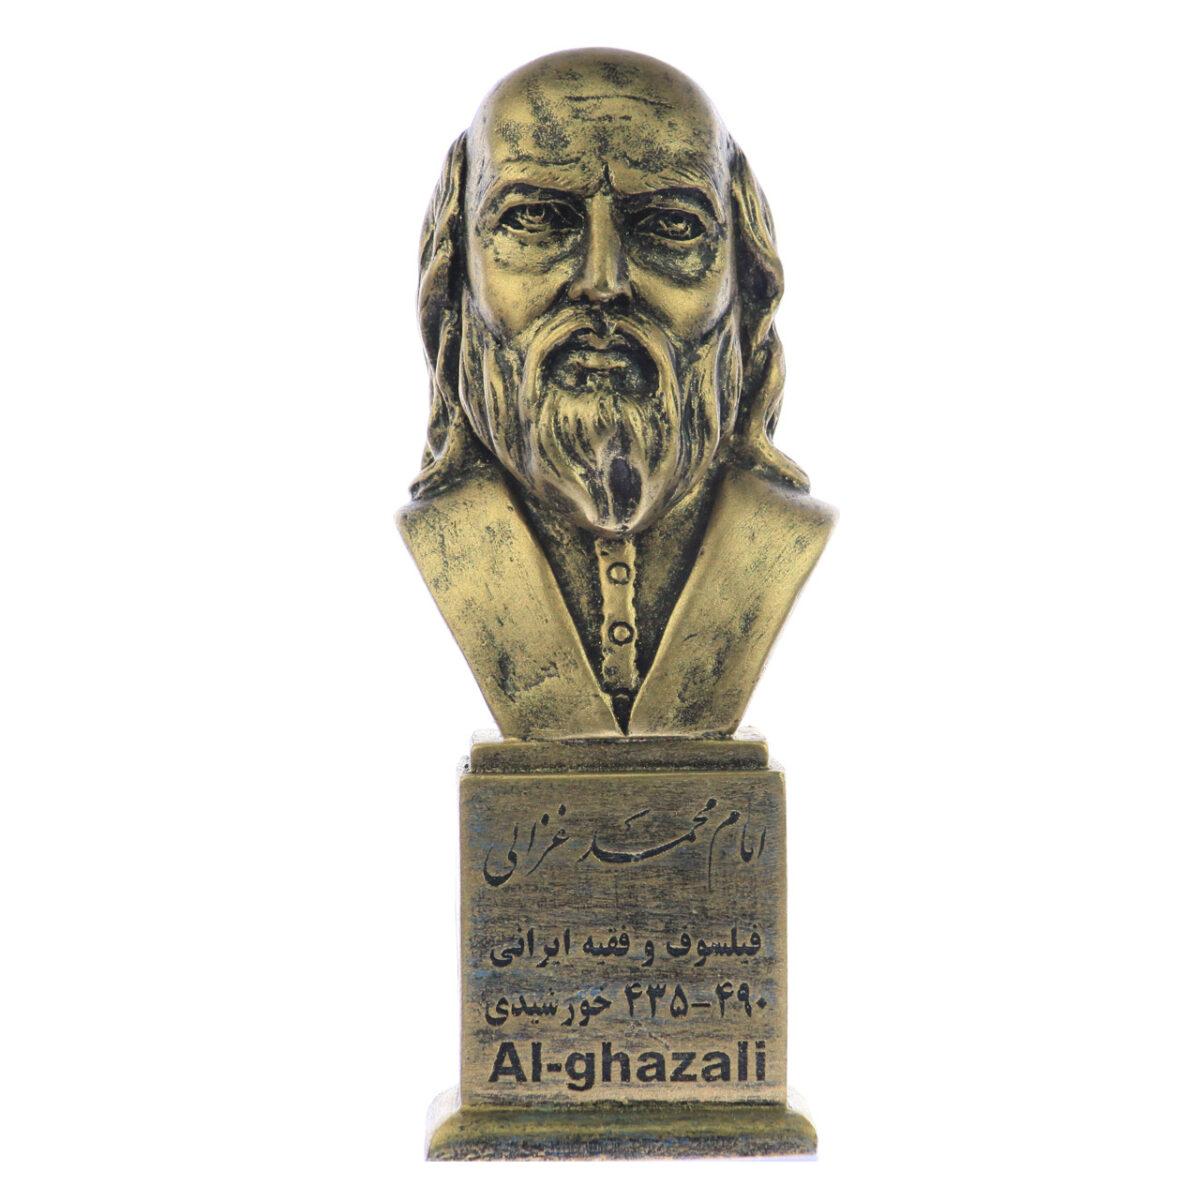 mohammad ghazali b 1200x1200 - سردیس امام محمد غزالی